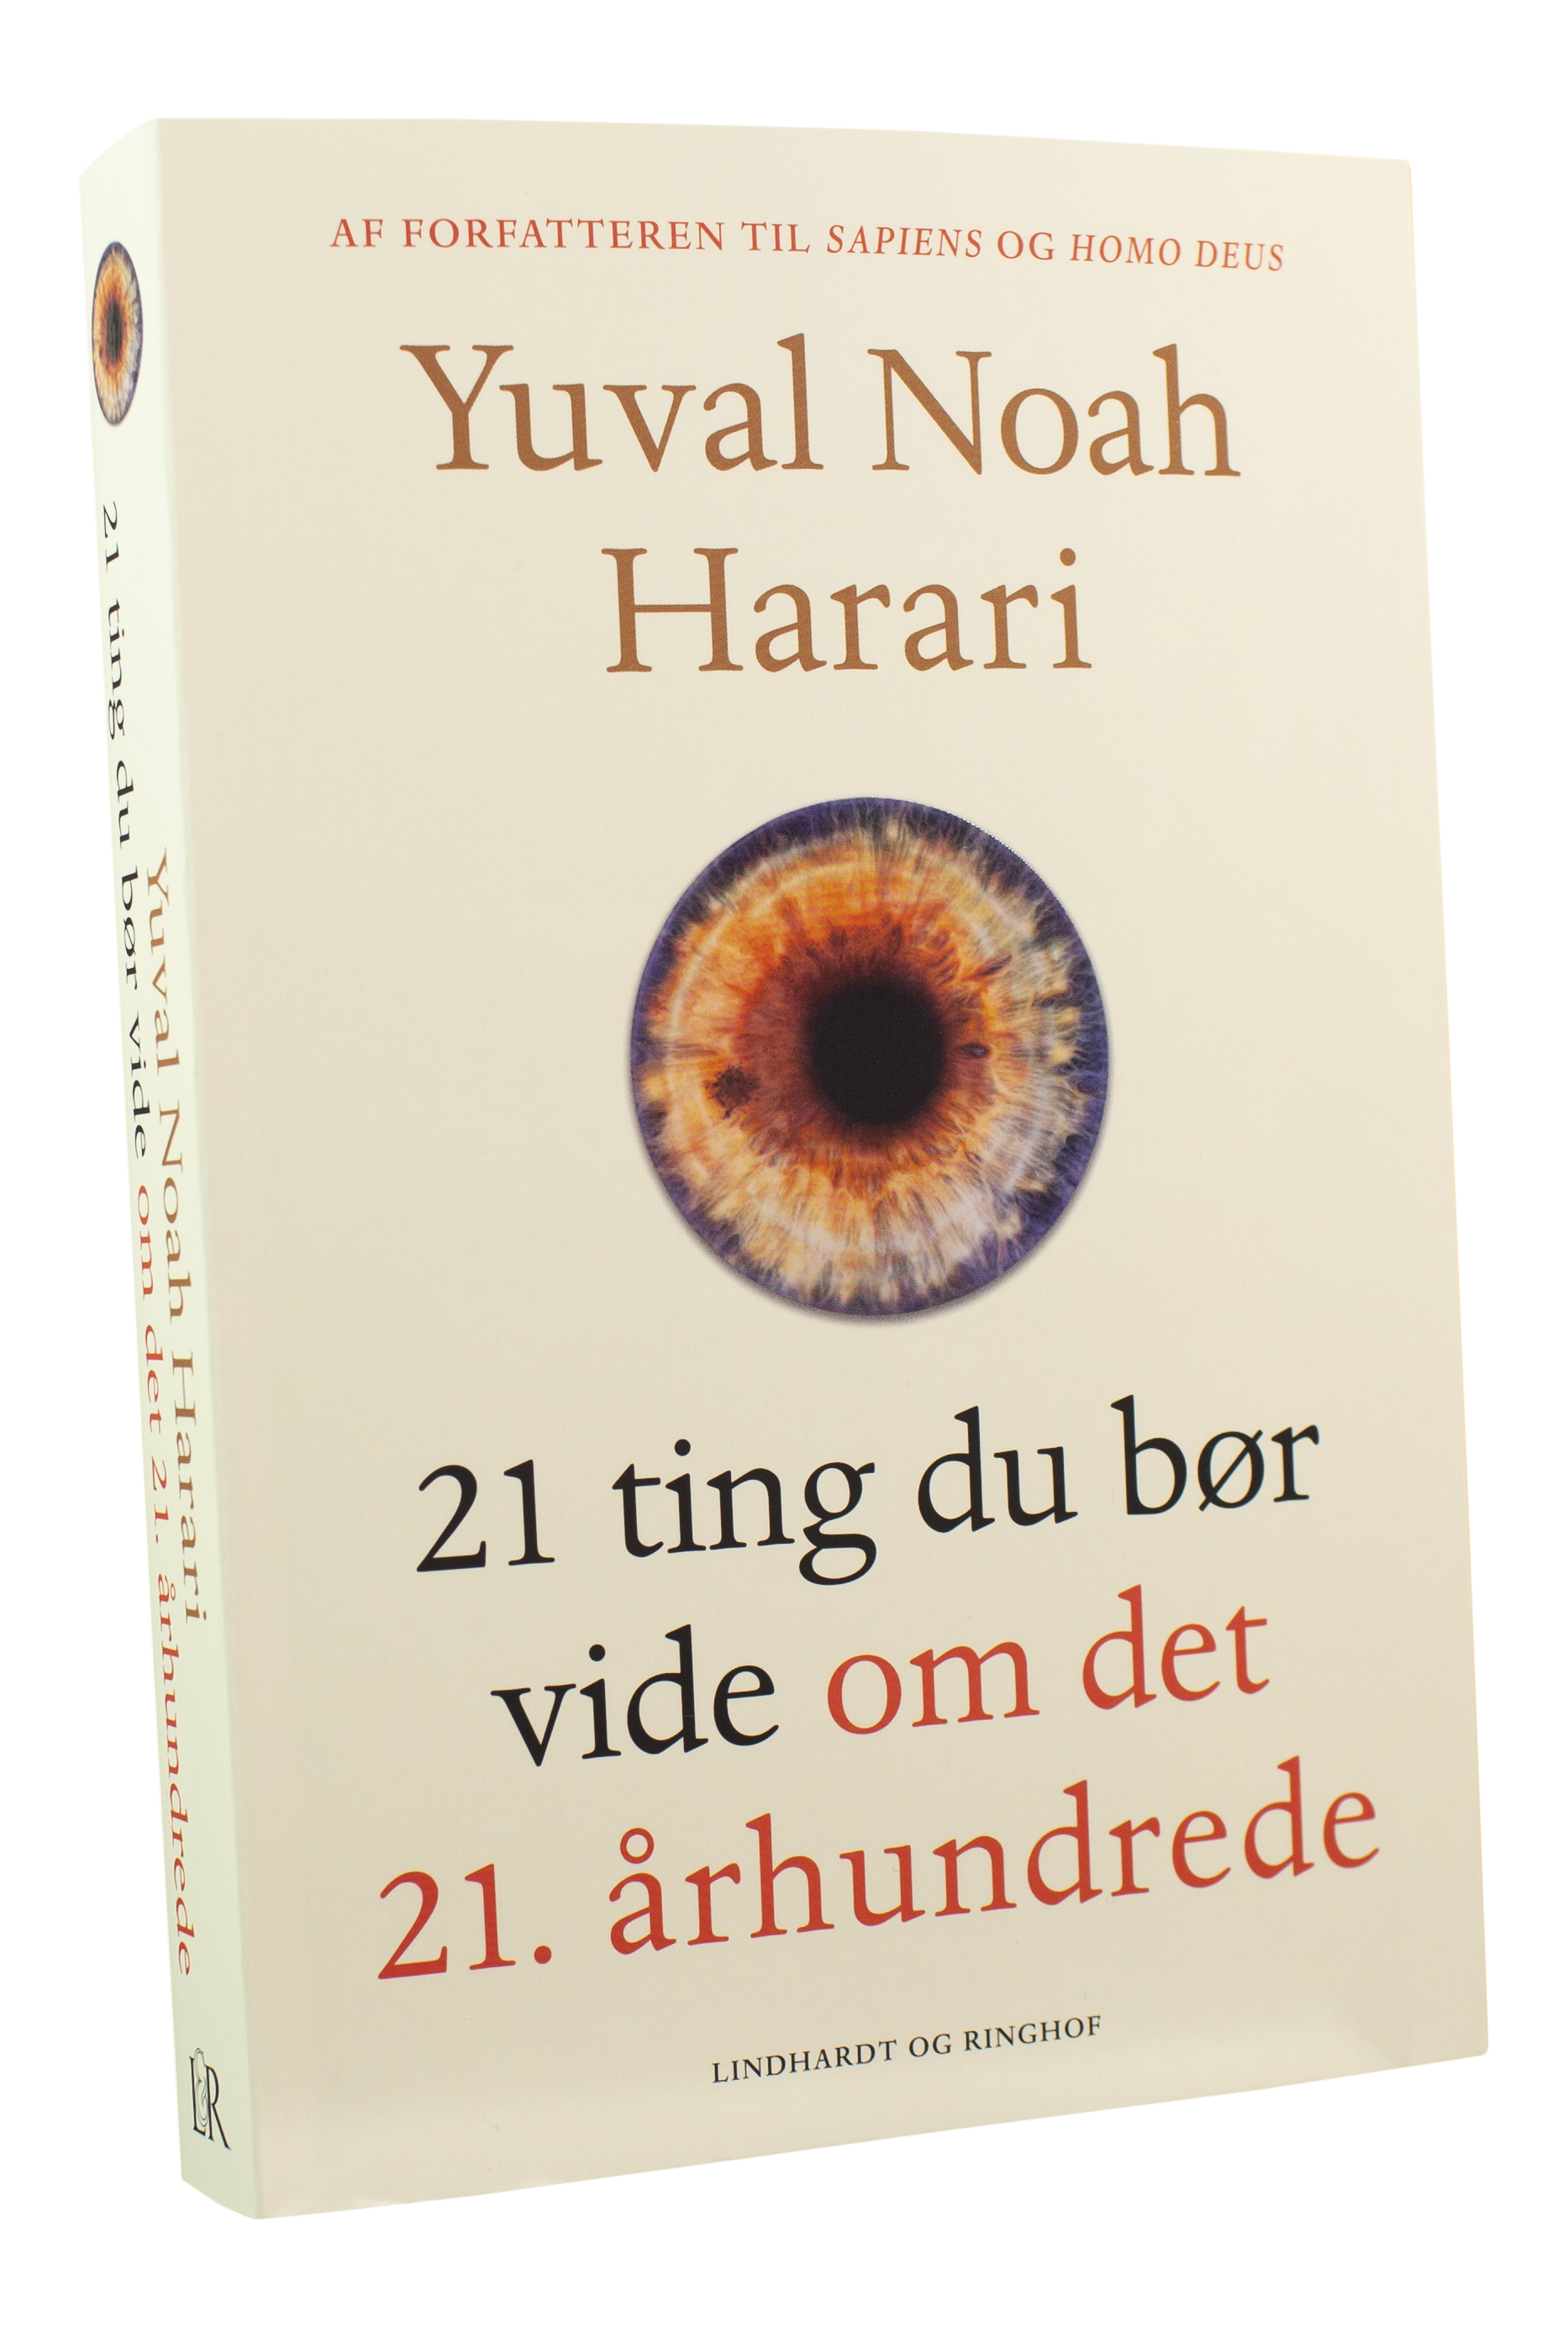 21 ting du bør vide om det 21. århundrede, Yuval Noah Harari, Yuval Harari